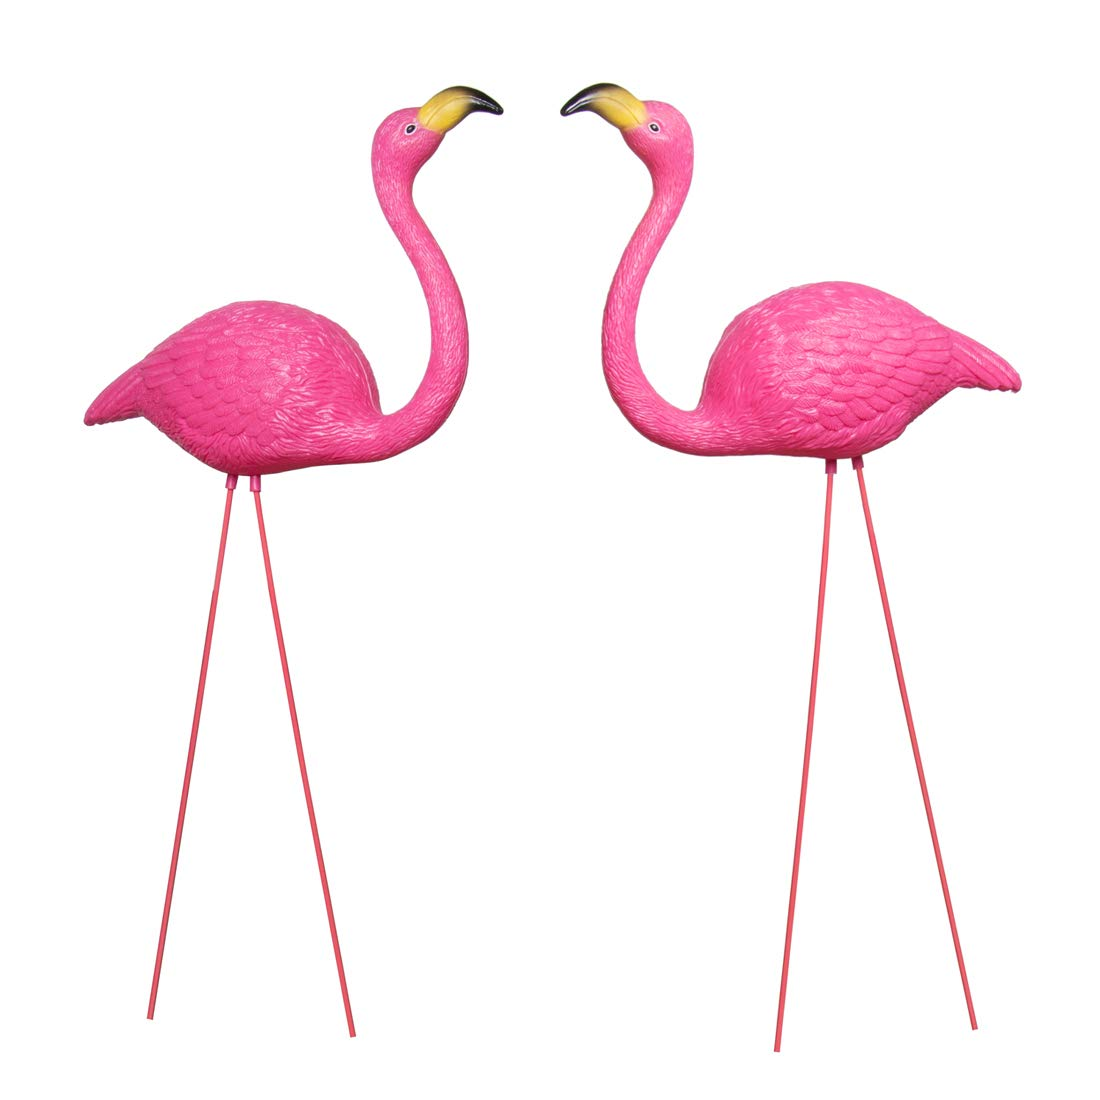 And Bird Pink Flamingo Novelty Yard Lawn Art Garden Ornaments, Garden Flamingo Decor, Adjustable Feet Length, Party Decor Supplier - Pack of 2